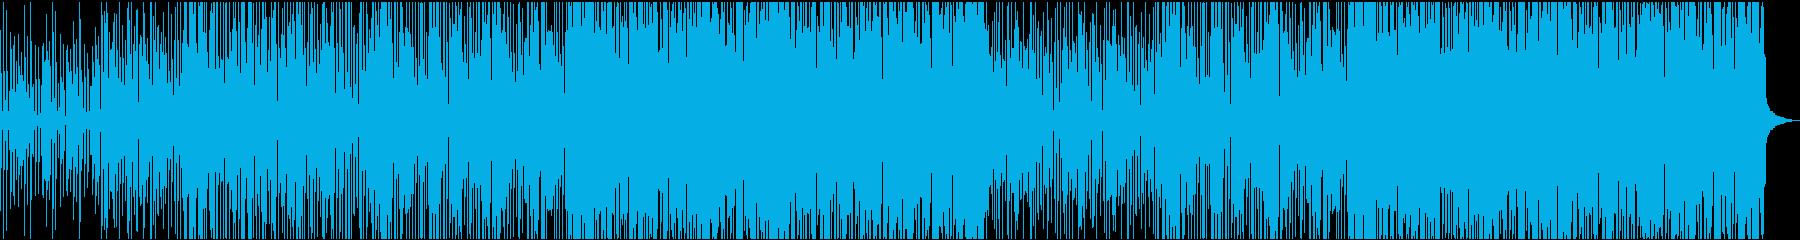 Funky Motionの再生済みの波形